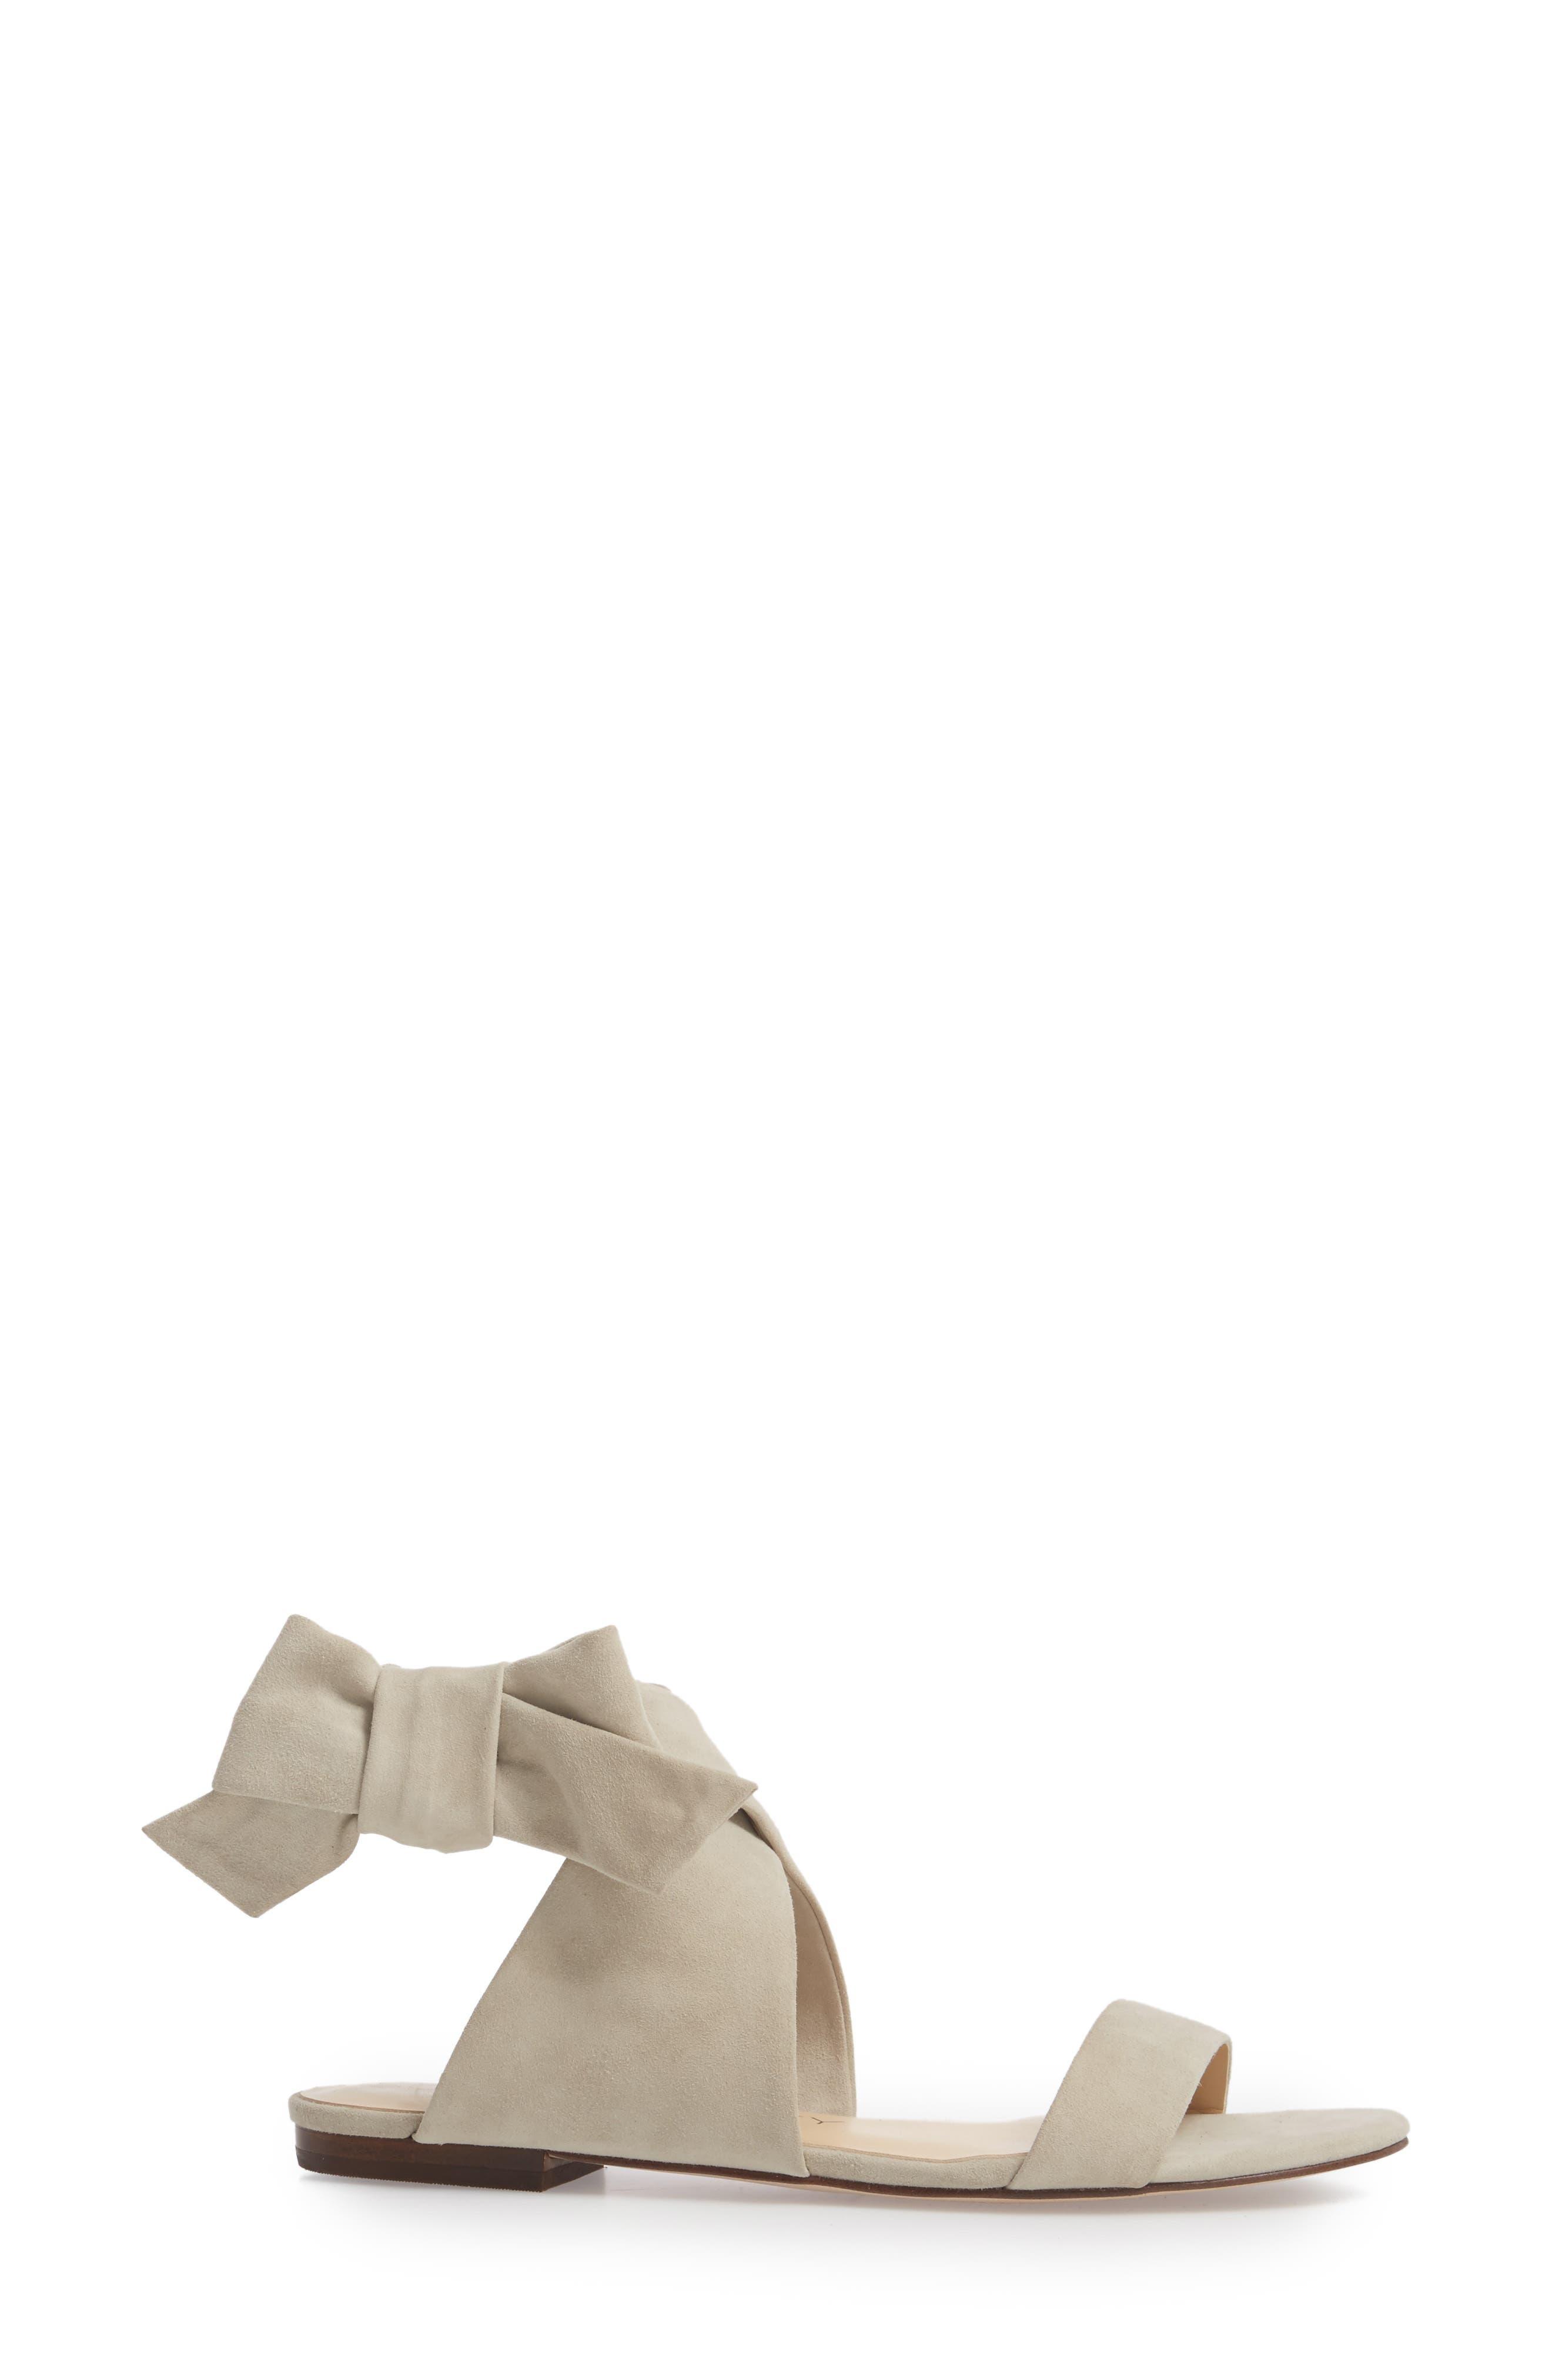 Calynda Bow Ankle Wrap Sandal,                             Alternate thumbnail 3, color,                             020